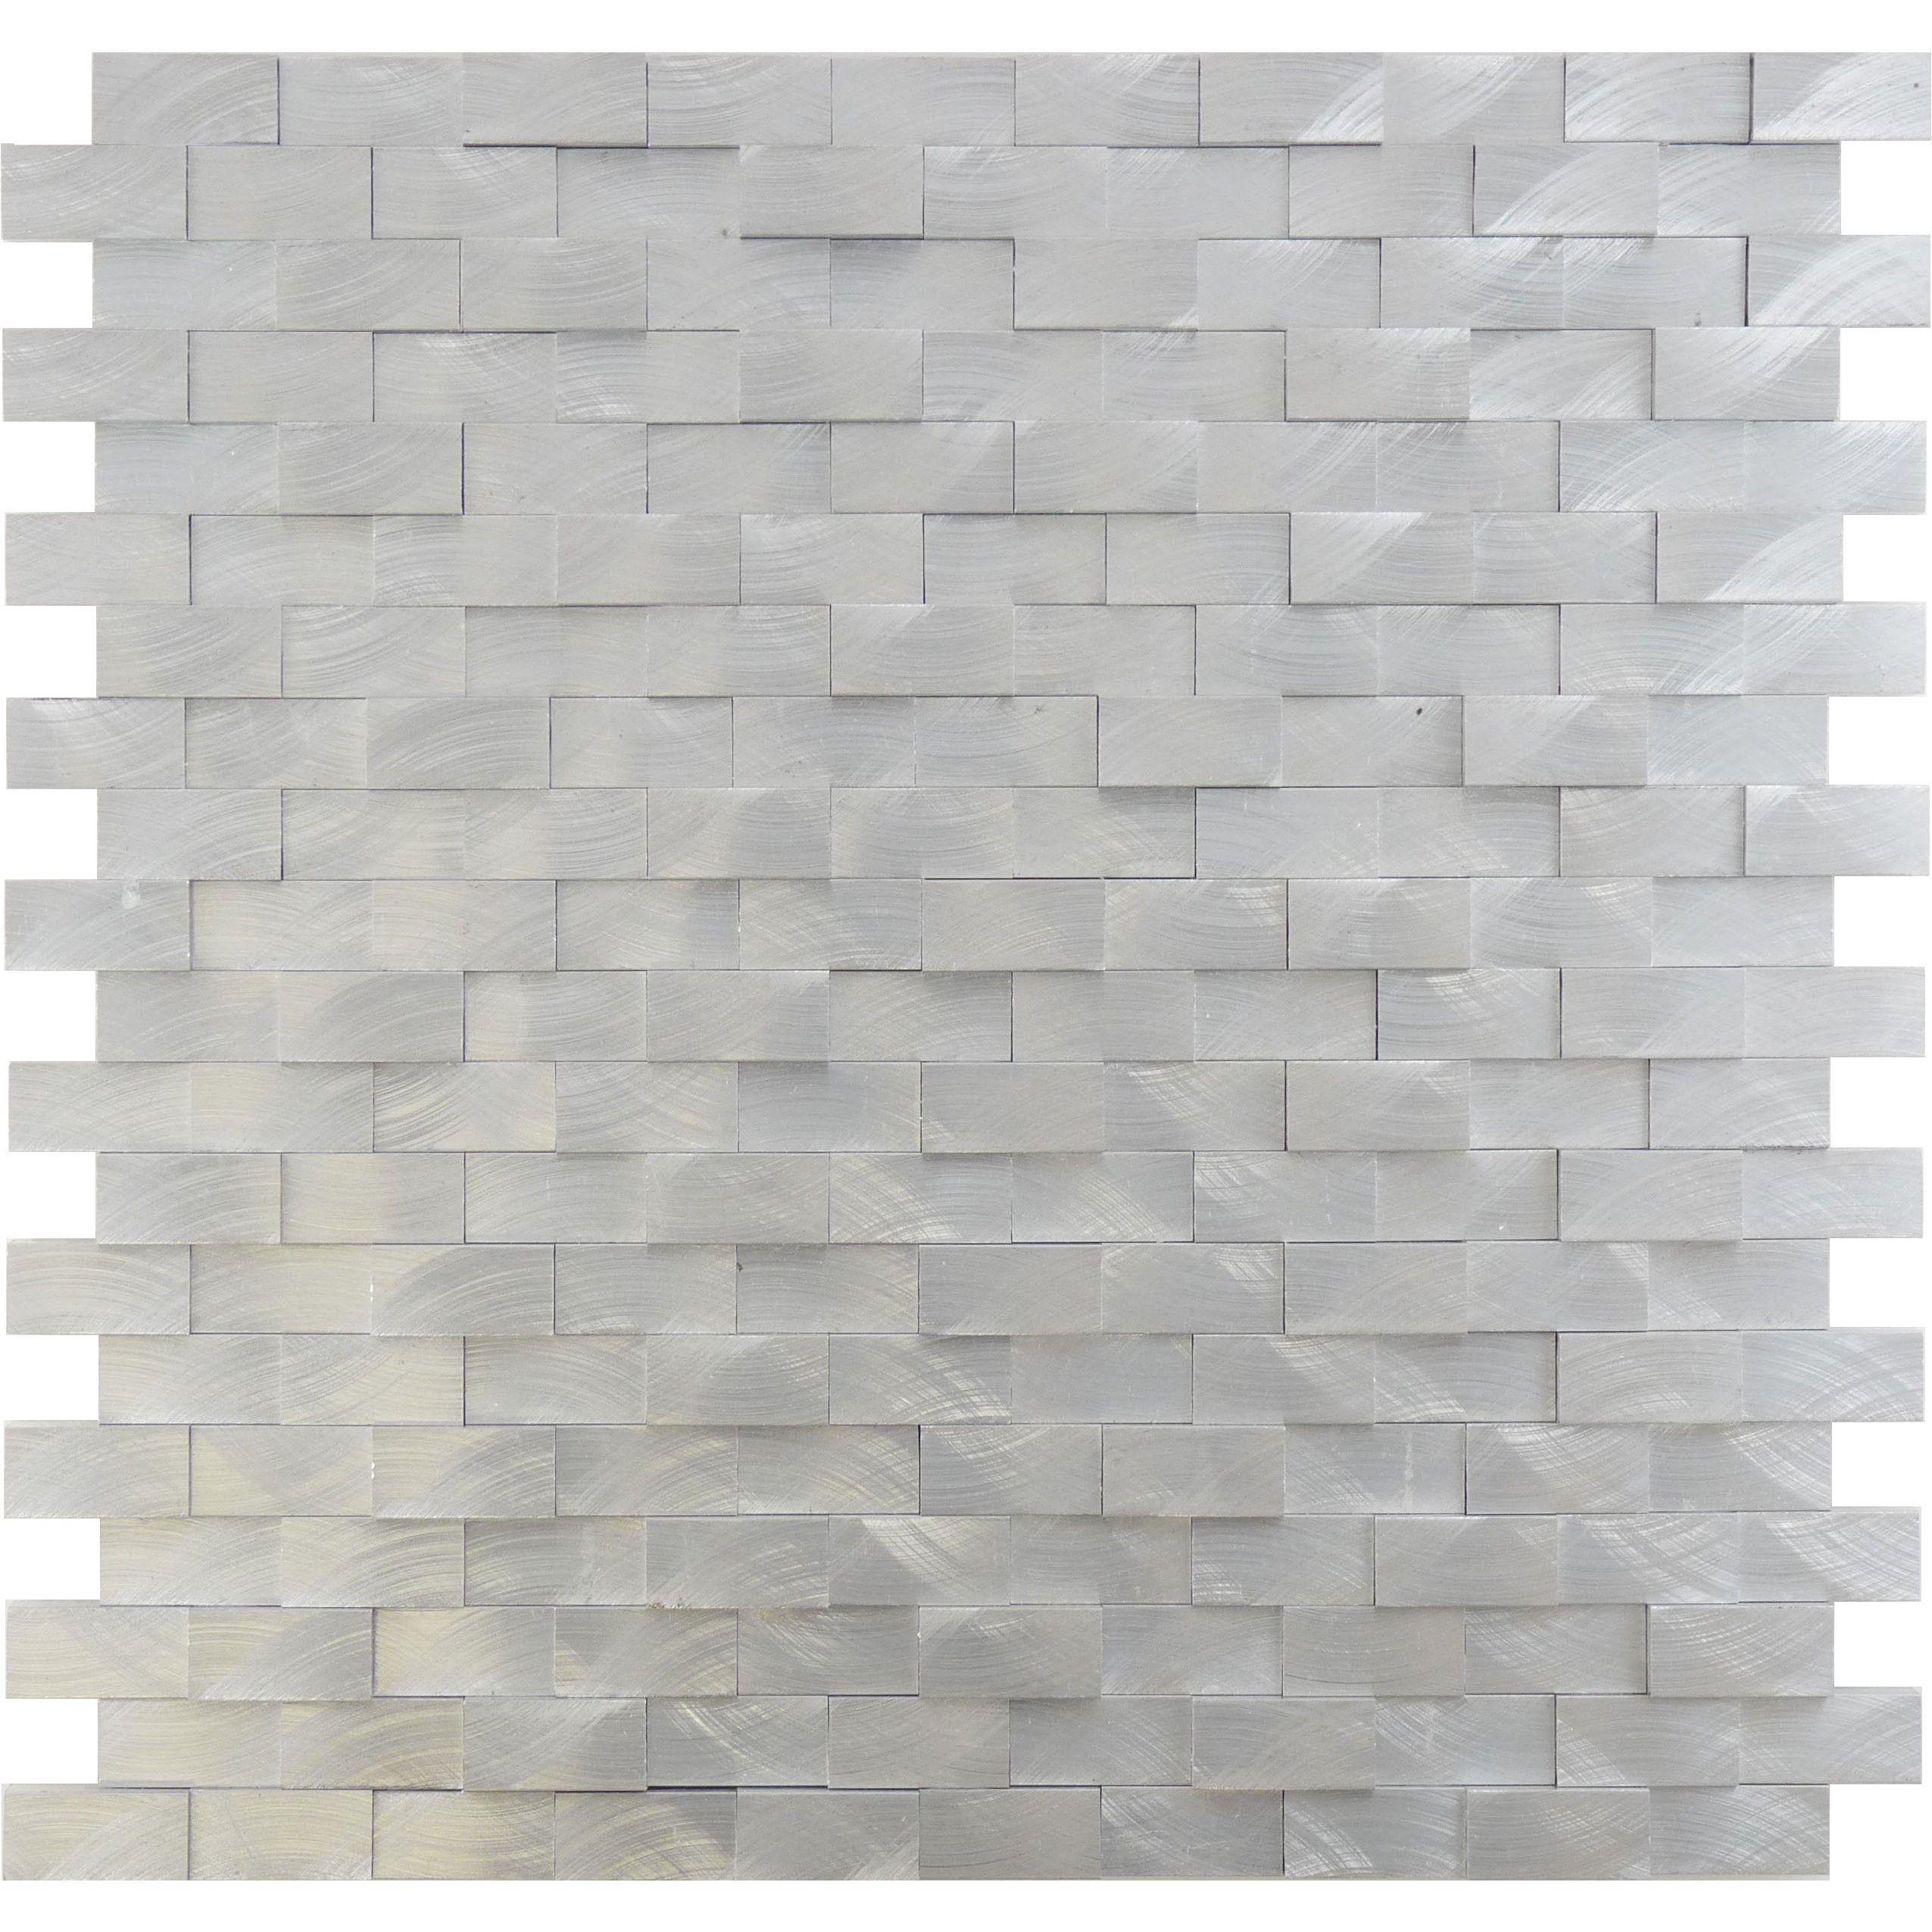 Sheet Size 11 7 8 X 11 7 8 Tile Size 1 2 X 1 1 8 Tiles Per Sheet 200 Tile Thickness 3 8 Sheet Mount Mesh Backed Sol Dimensional Tile Tiles Metal Tile